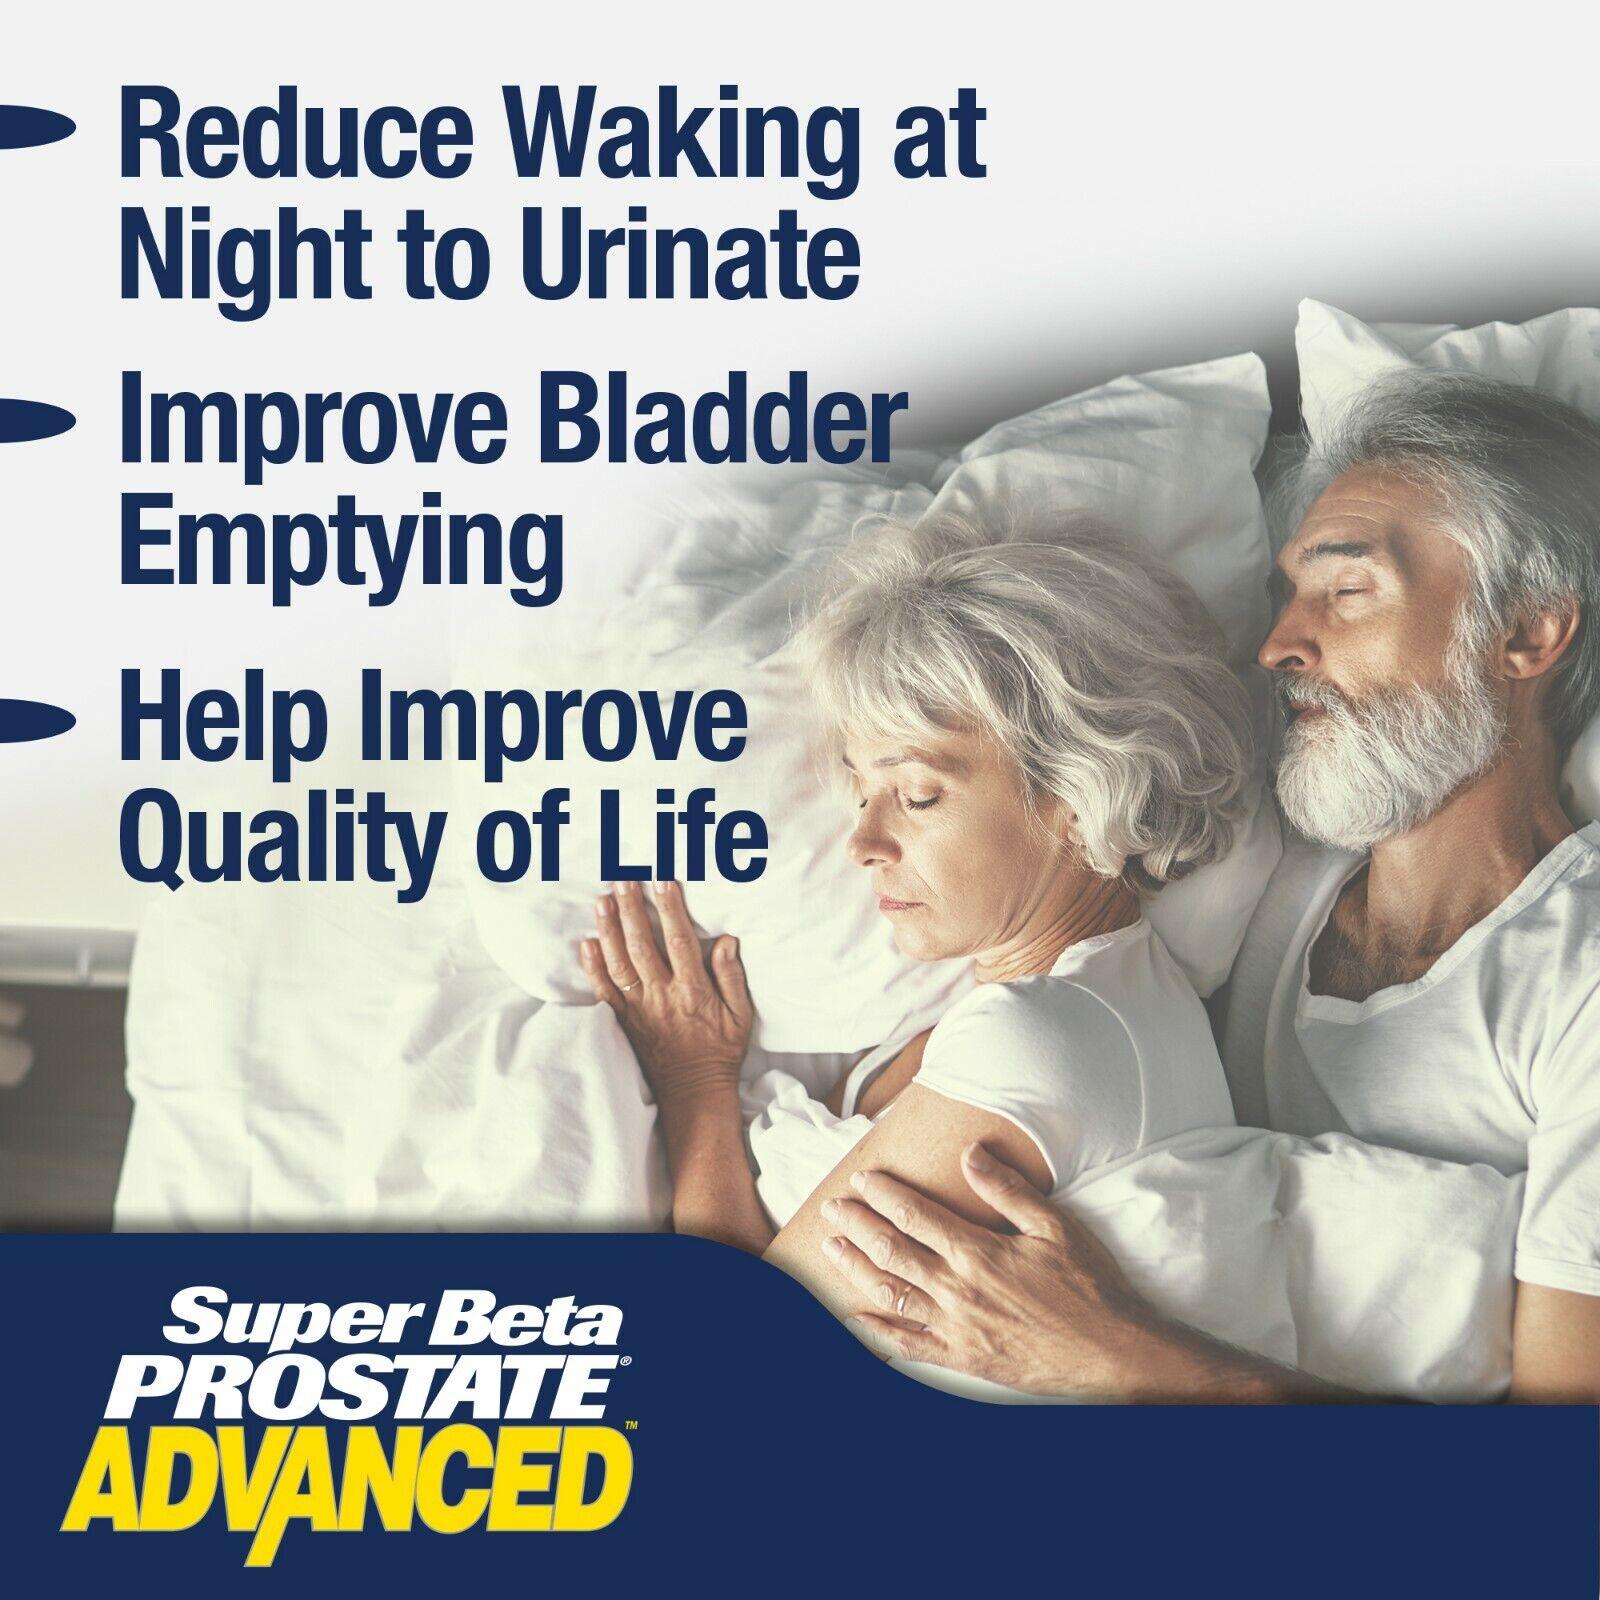 Super Beta Prostate Advanced - Prostate Supplement - Brand New - Free S&H 3